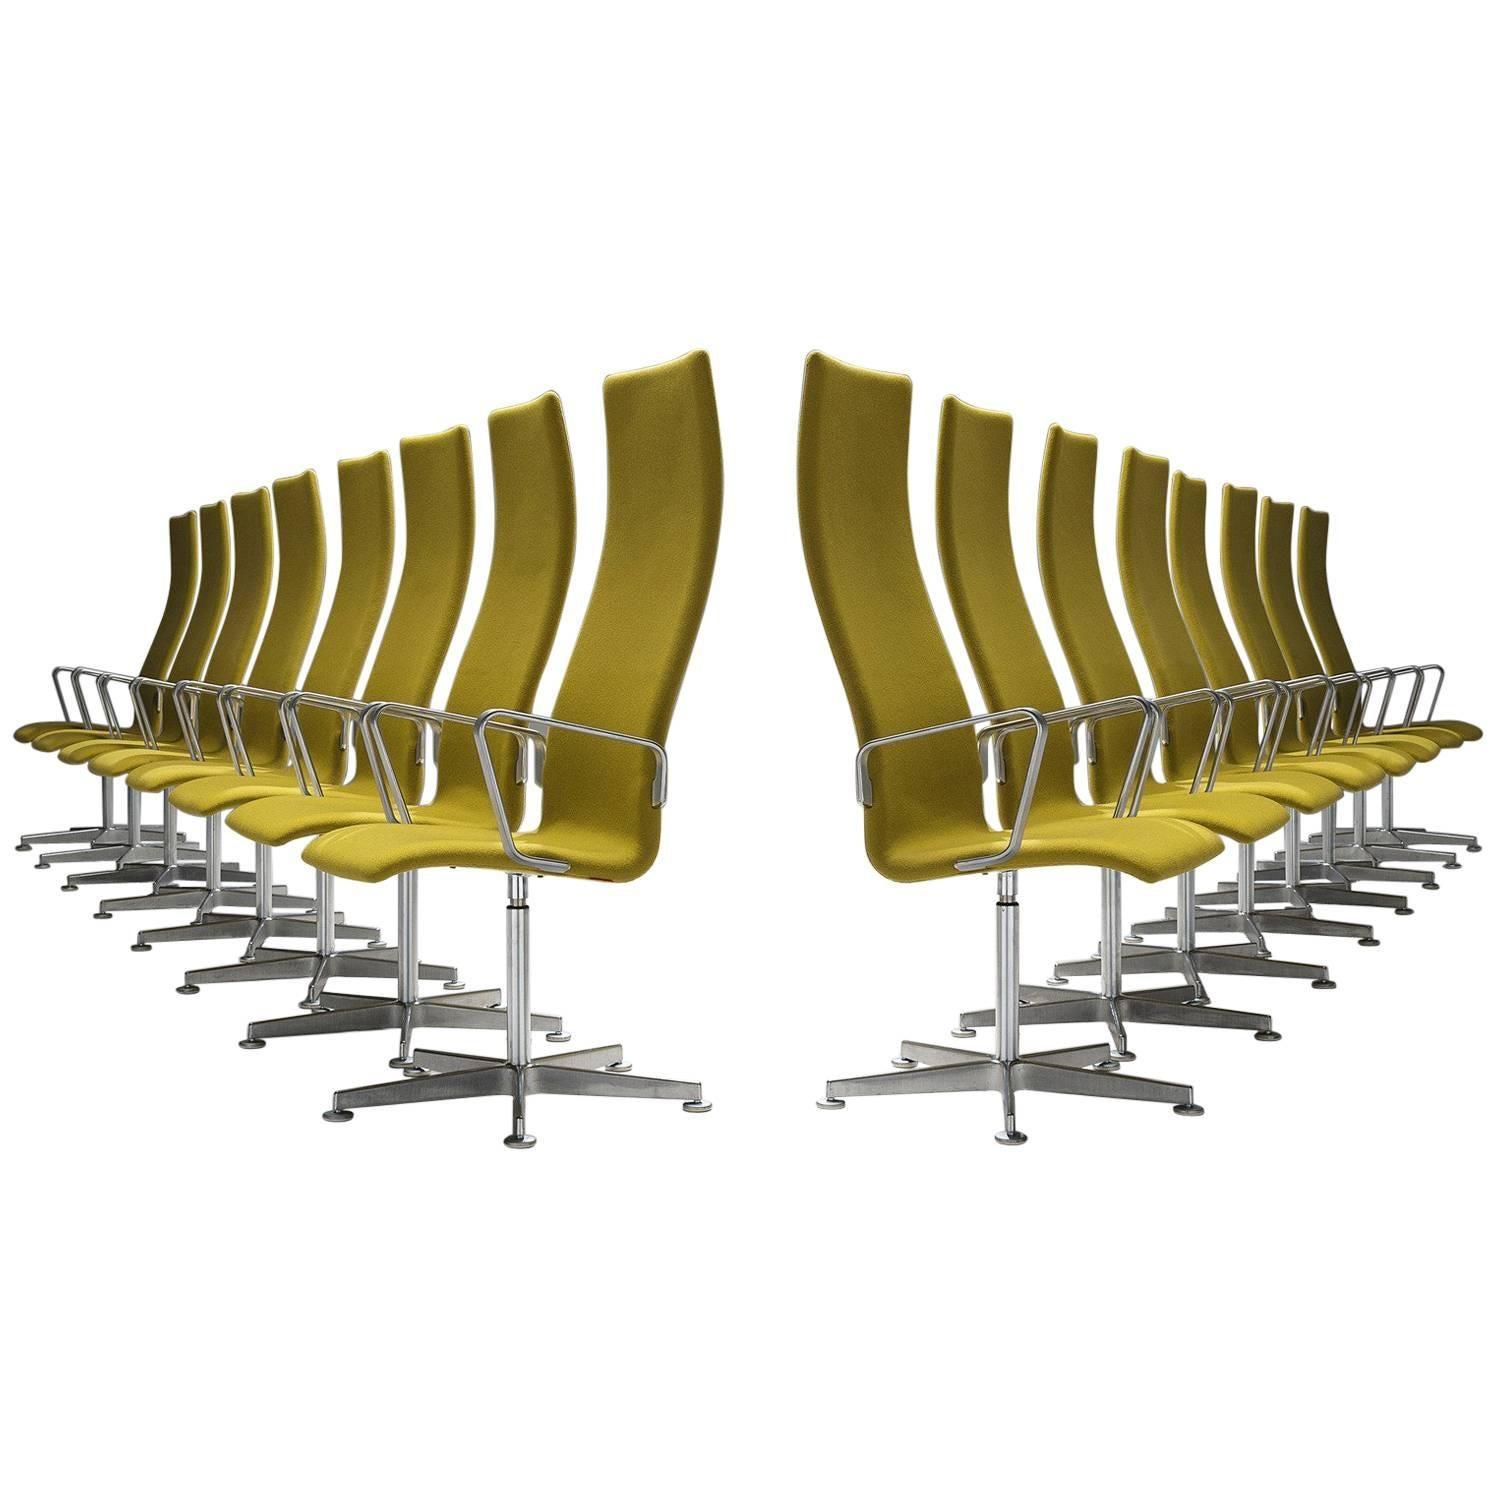 Set Of 16 Arne Jacobsen High Back U0027Oxfordu0027 Swivel Chairs For Fritz Hansen